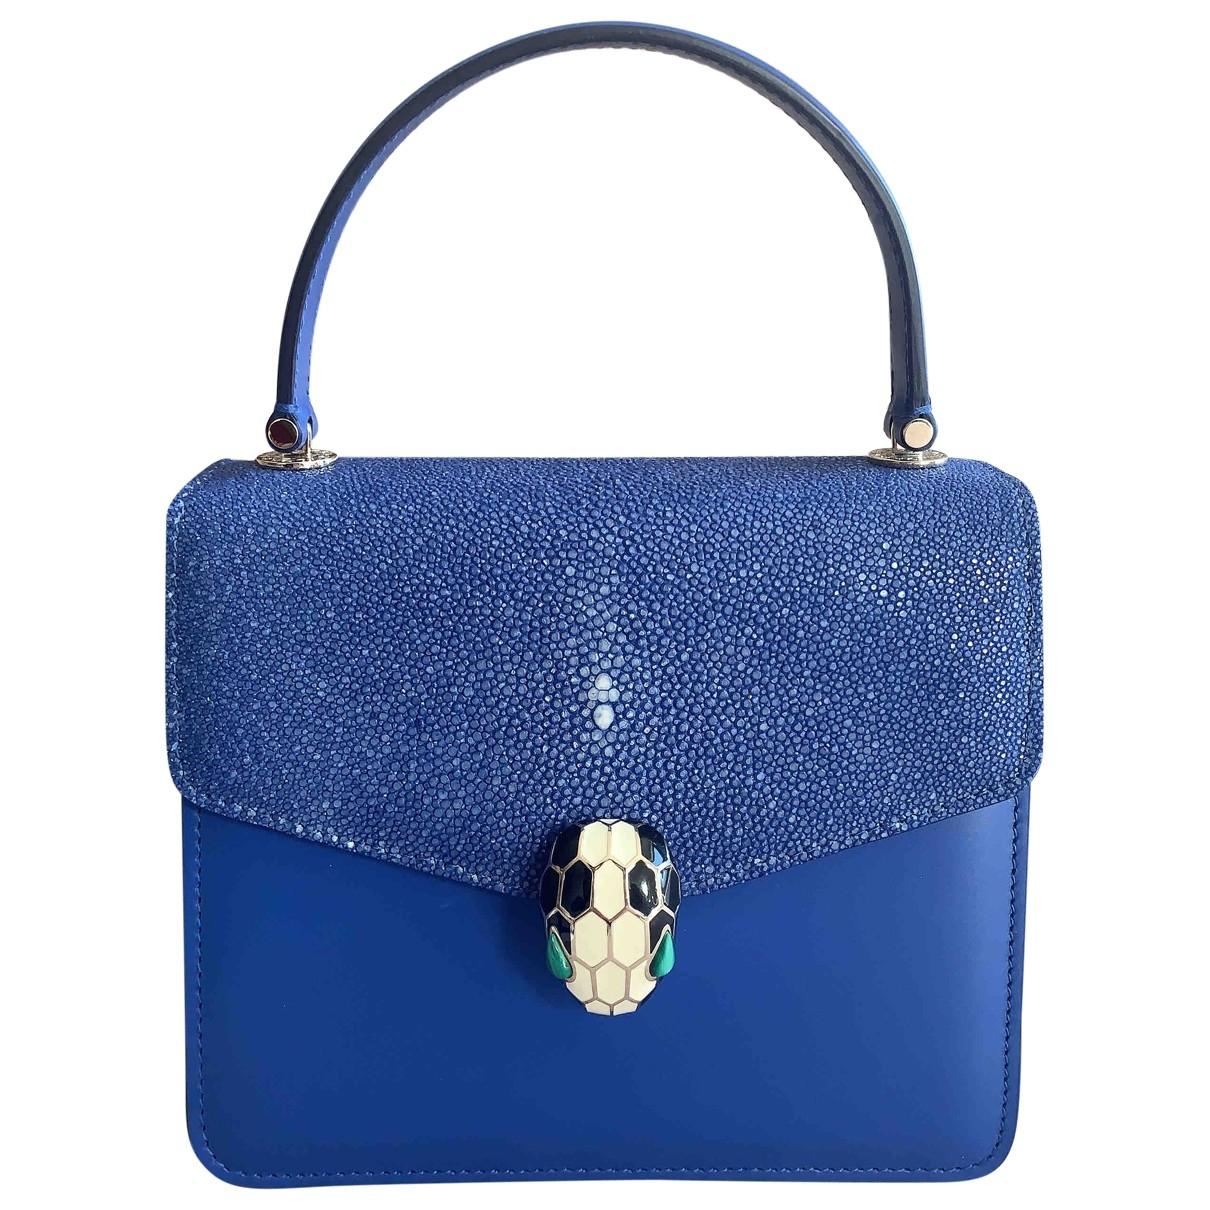 Bvlgari Serpenti Blue Stingray handbag for Women \N